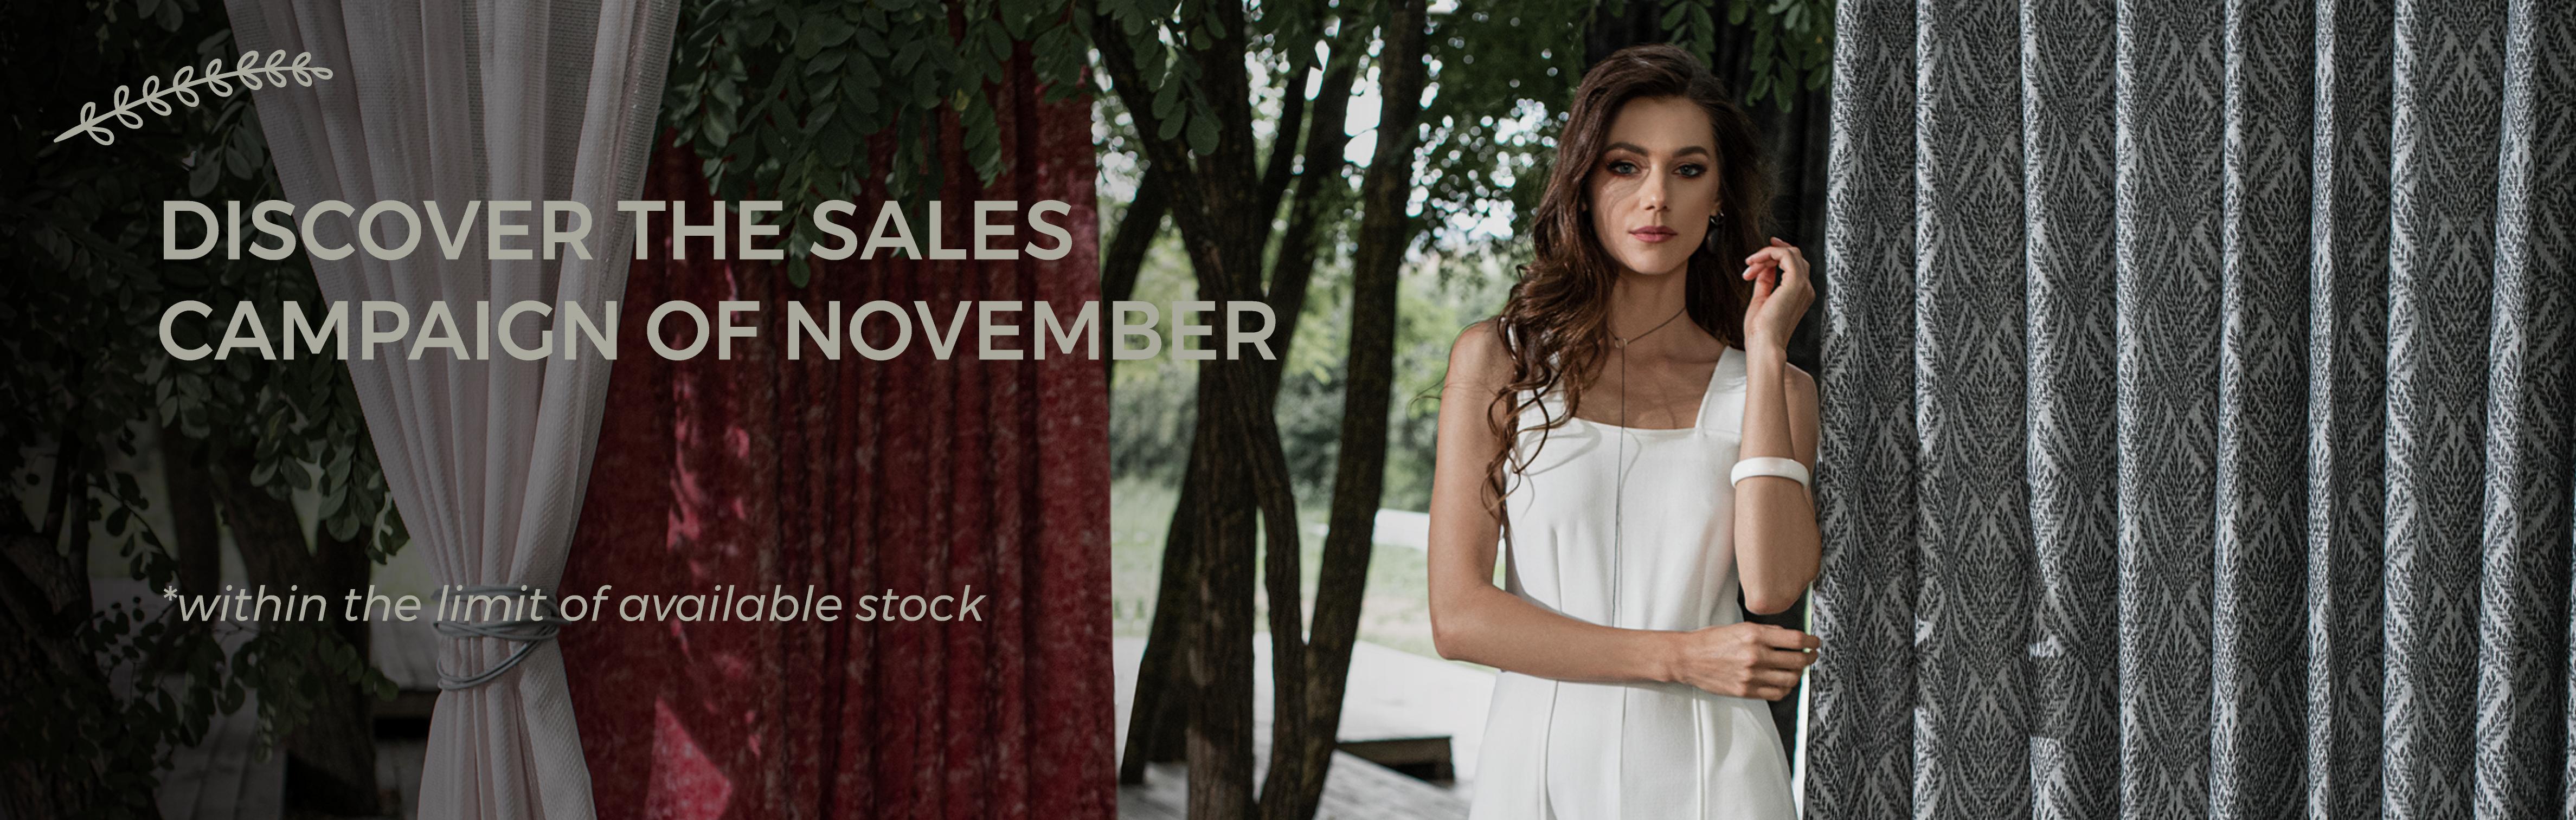 November's Sales Campaign